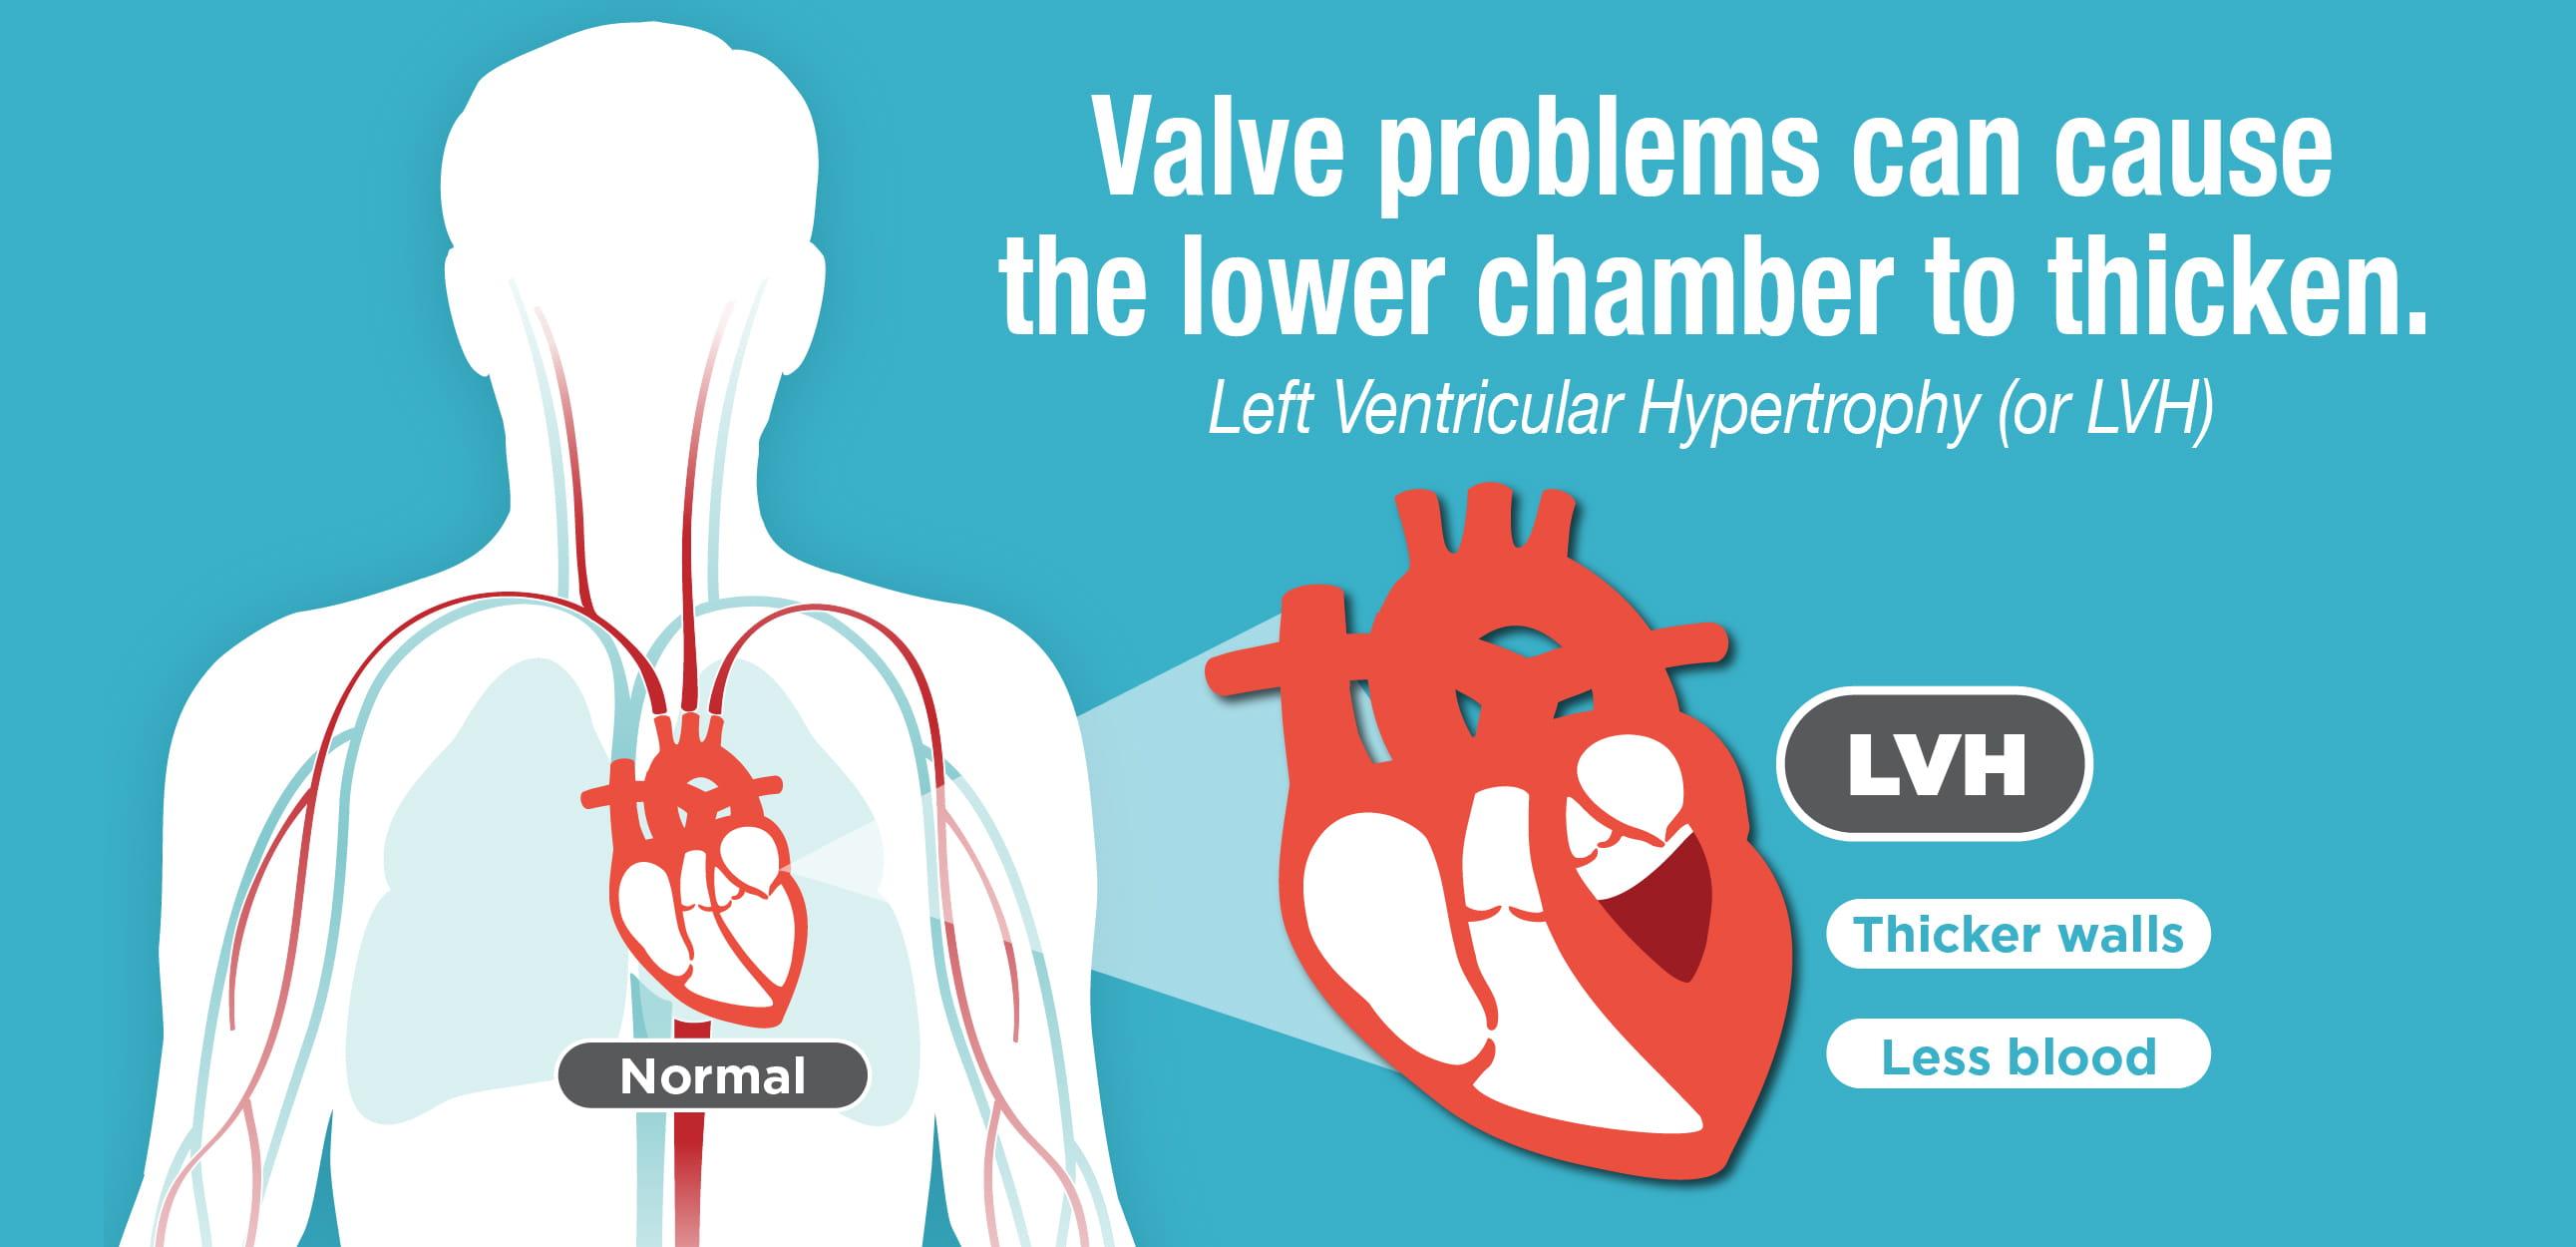 banner de la hipertrofia ventricular izquierda HVI